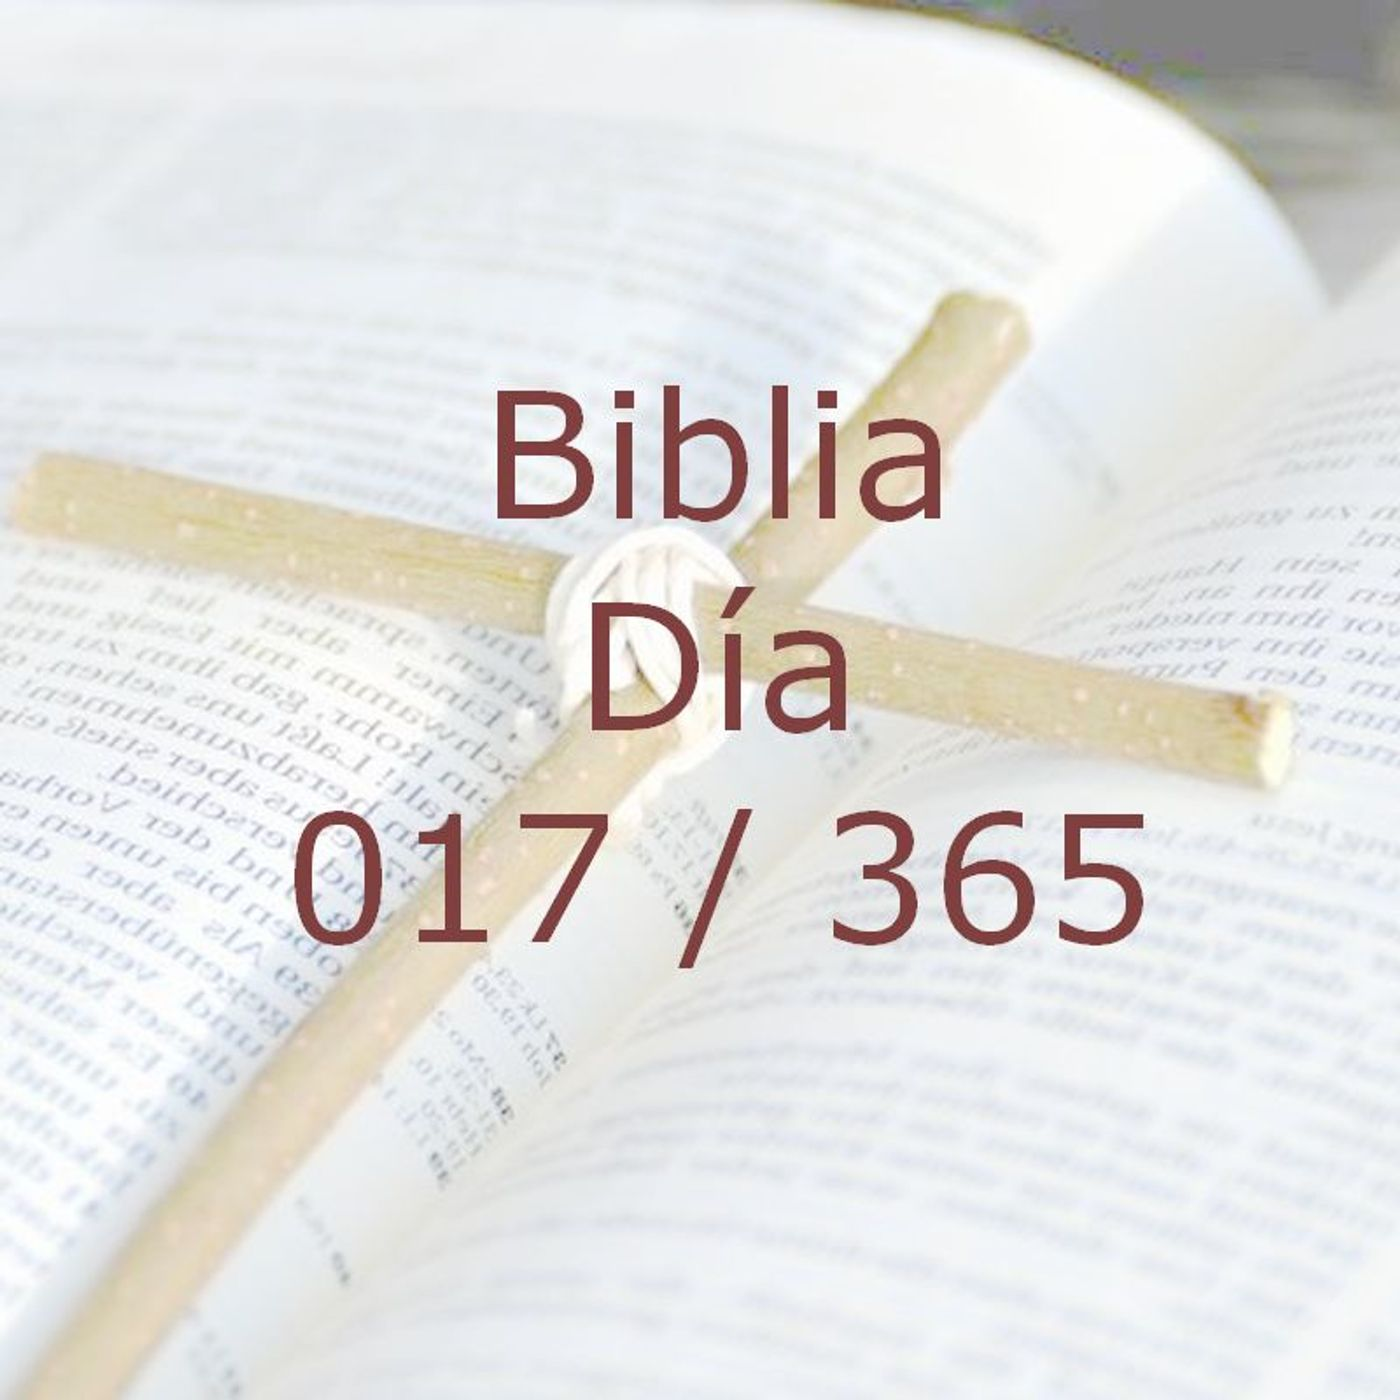 365 dias para la Biblia - Dia 017